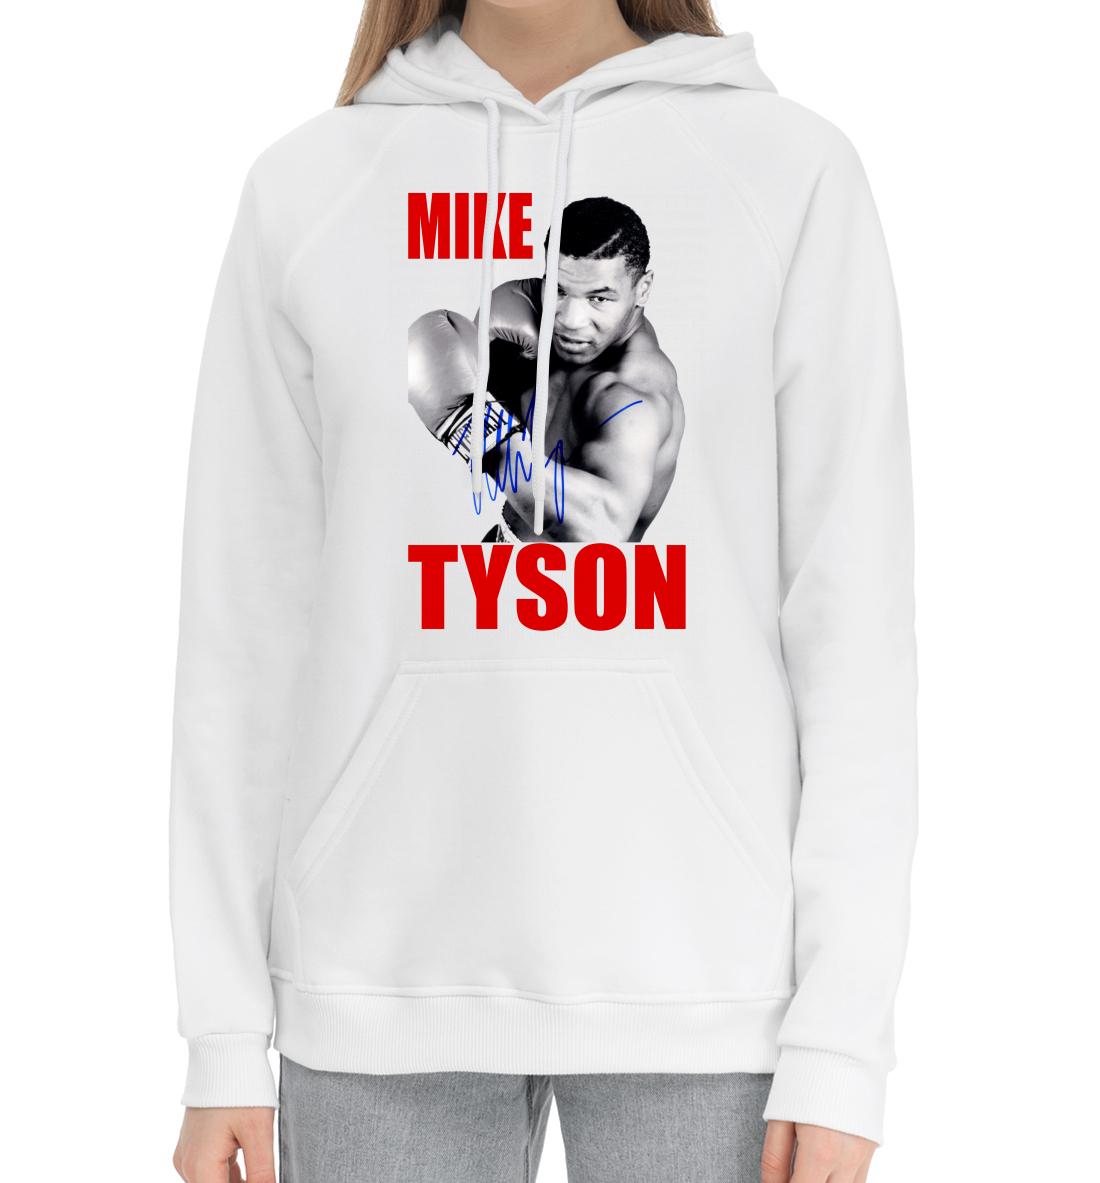 «Тайсон» — хлопковый женский, артикул: MIK-938898-hhu-1